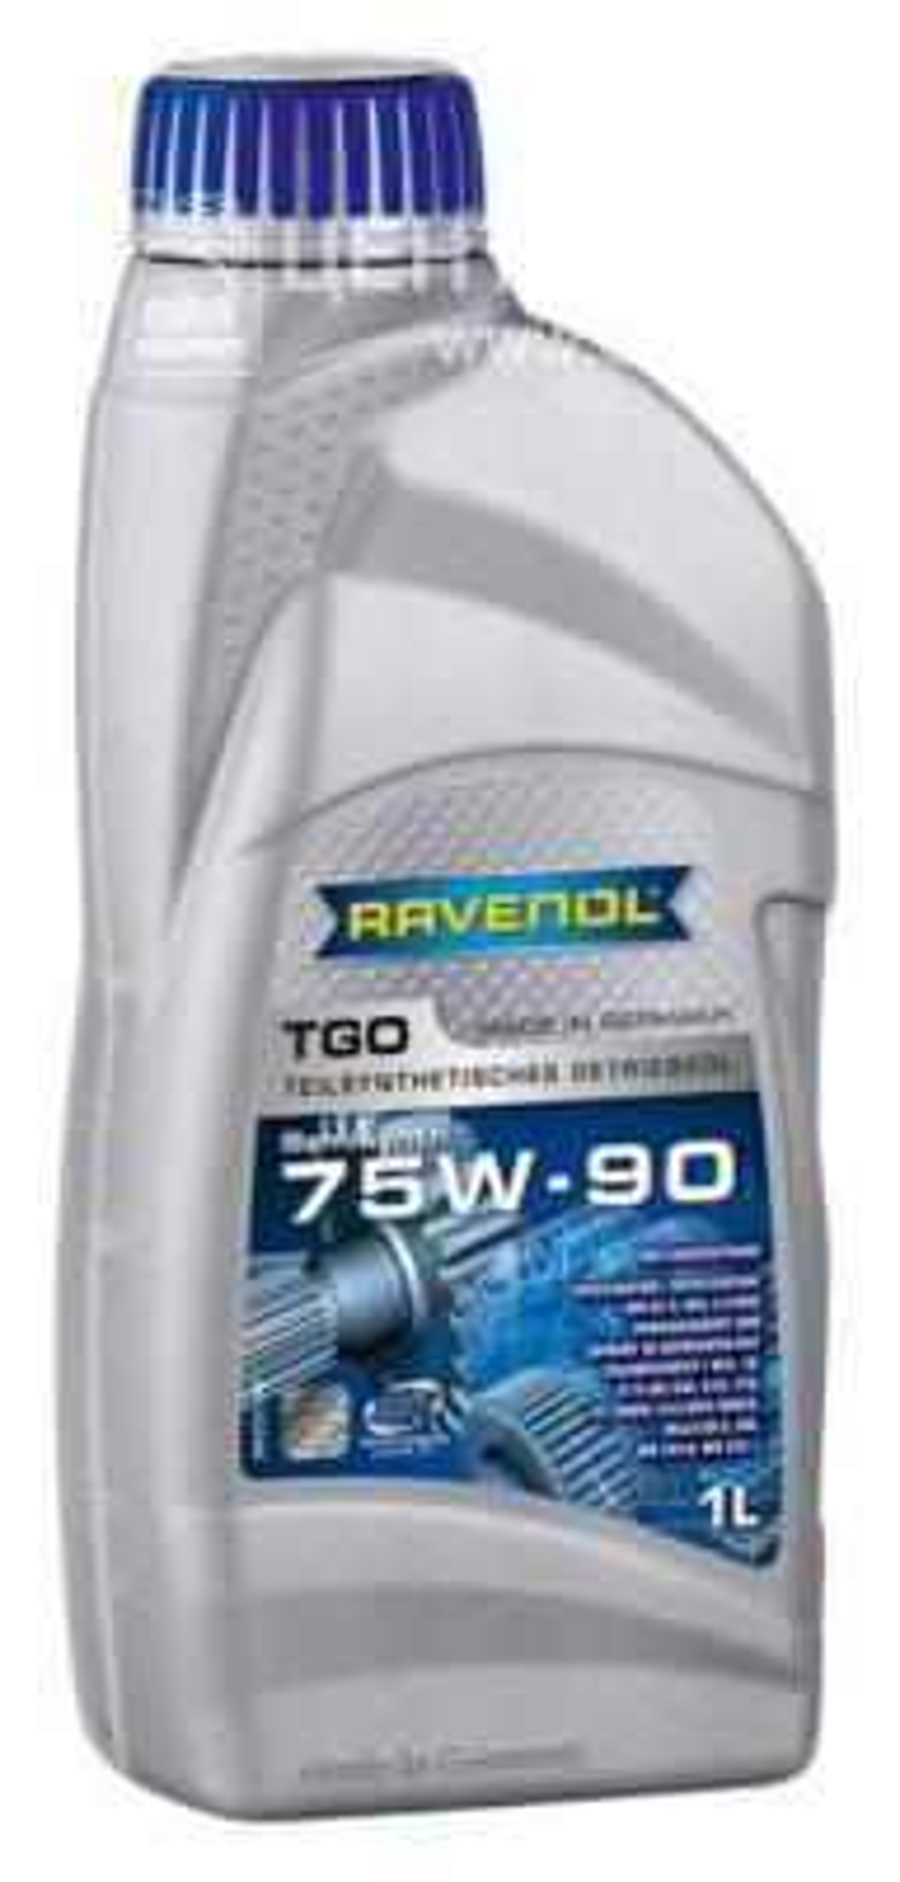 Трансмиссионное масло ravenol tgo sae 75w-90 gl-5 ( 1л) new